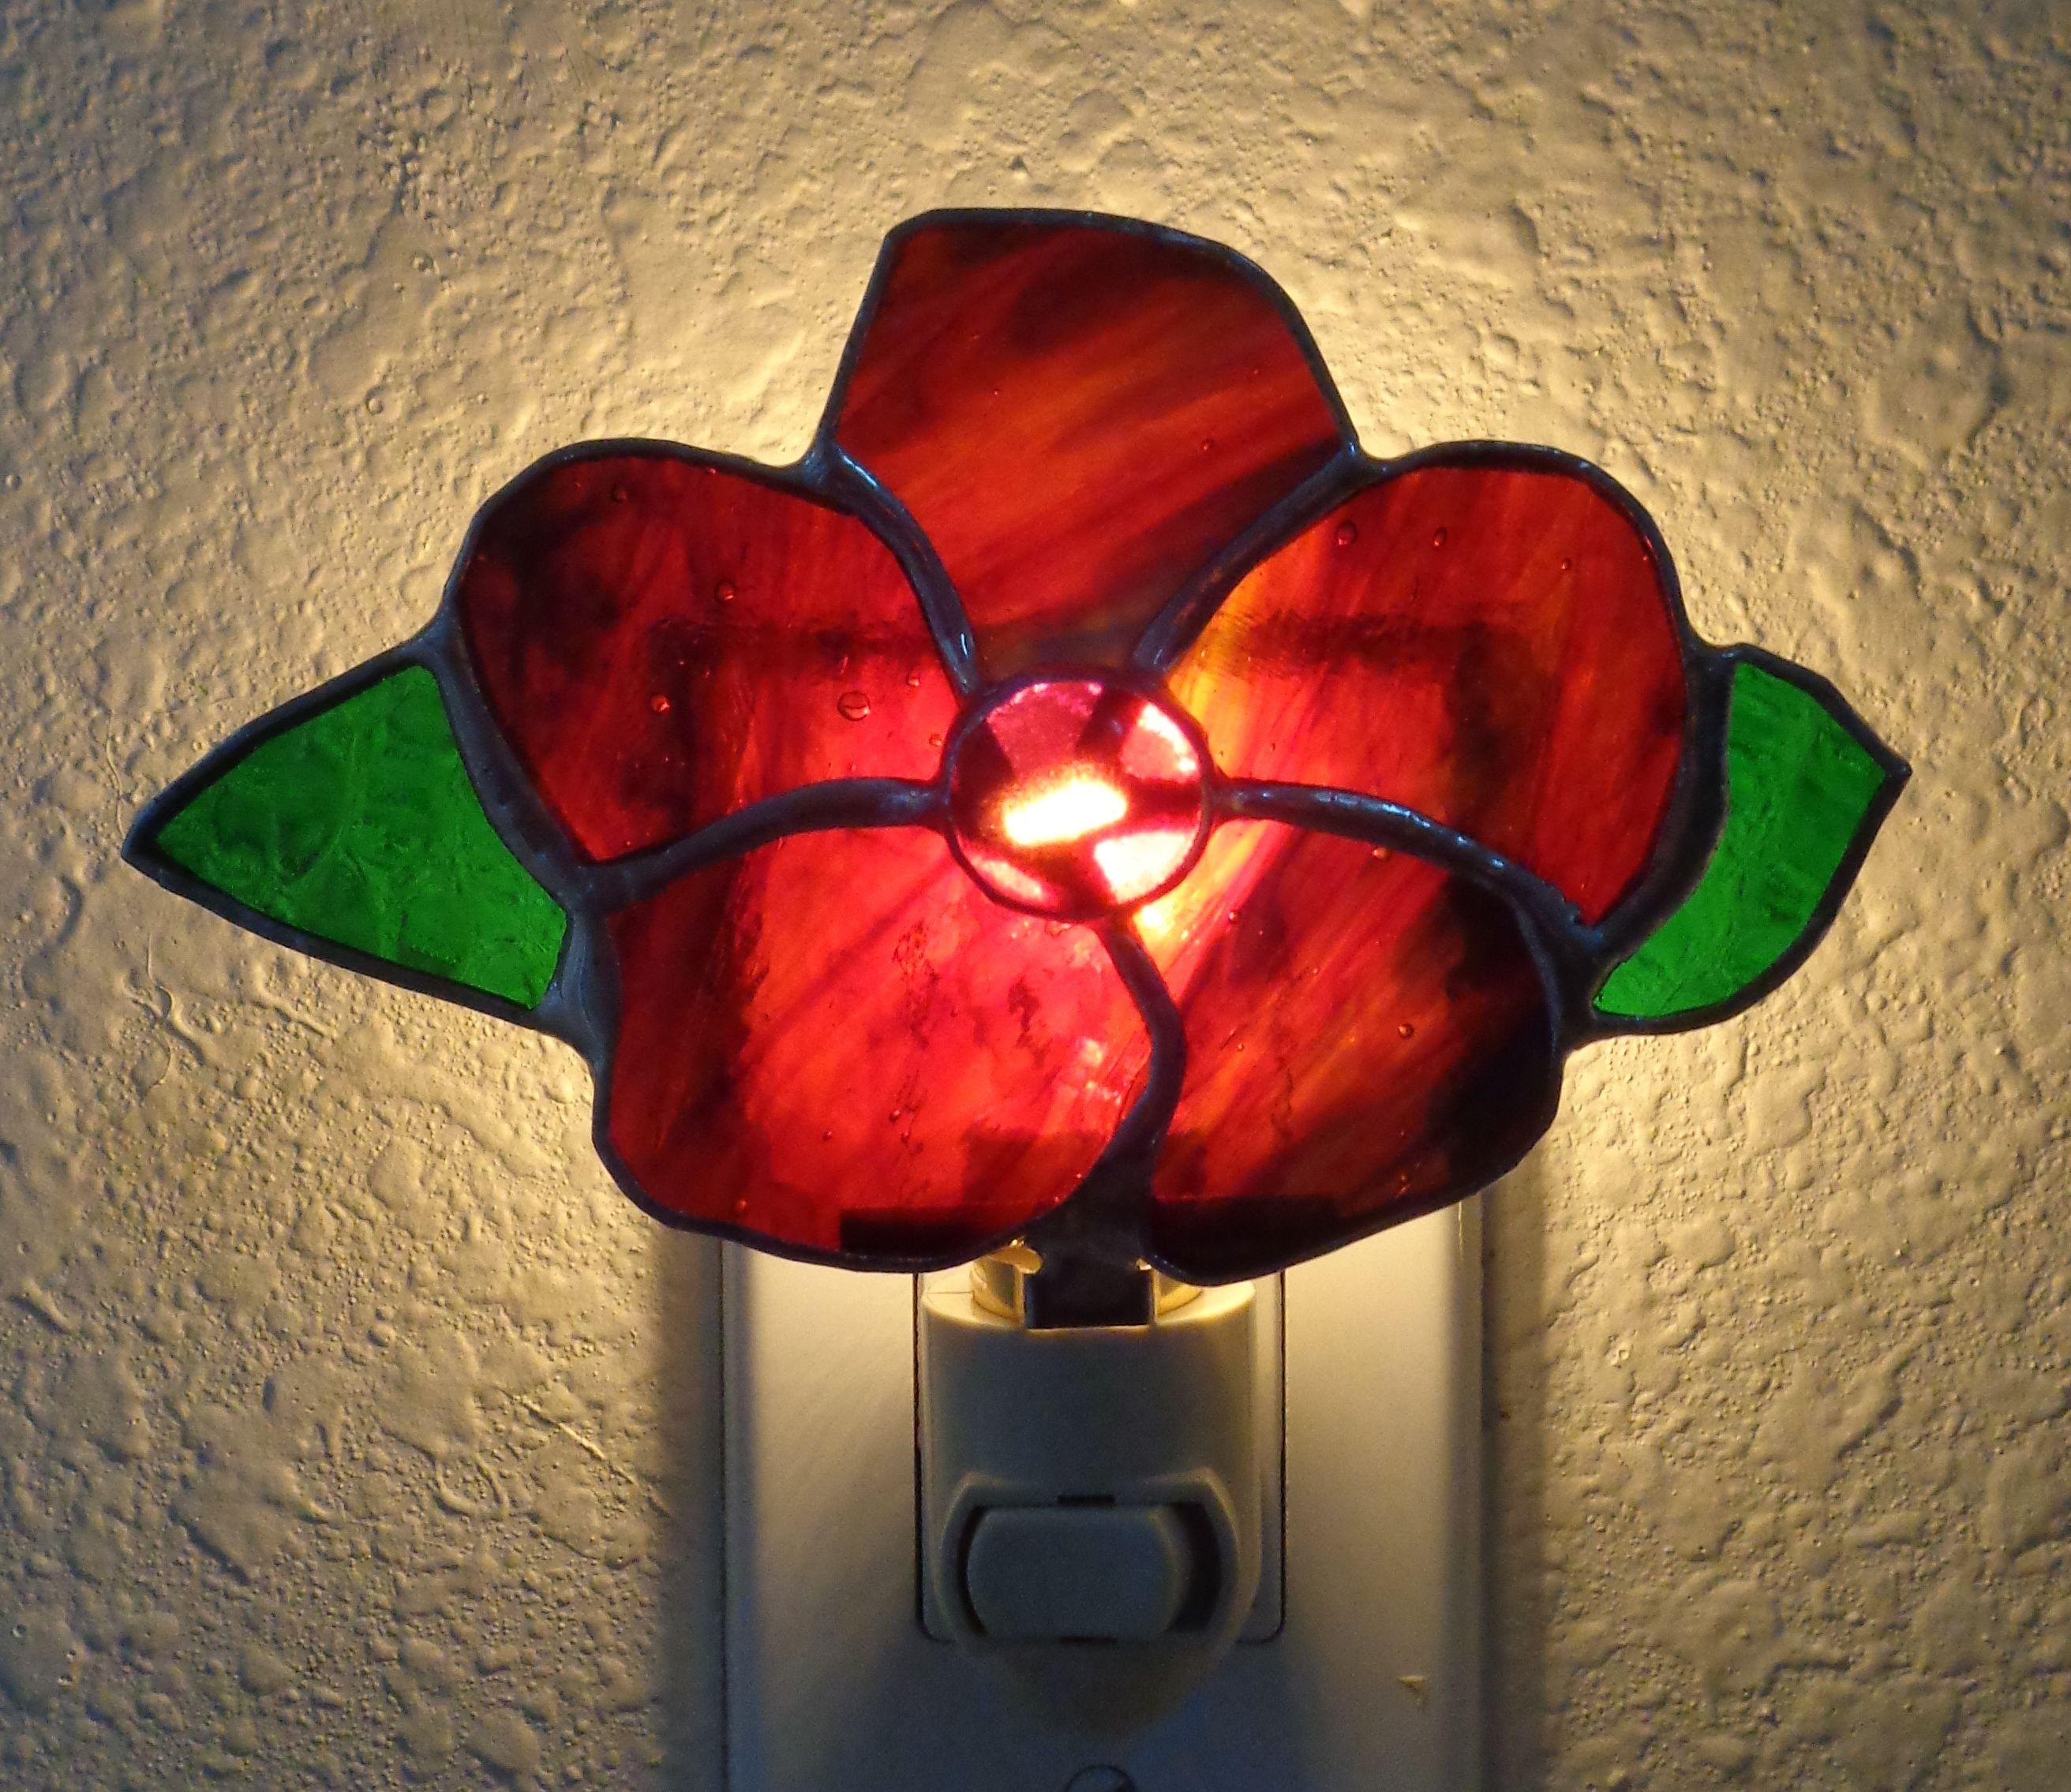 Buy Handmade Night Lights Made To Order From Krysia Designs Custommade Com